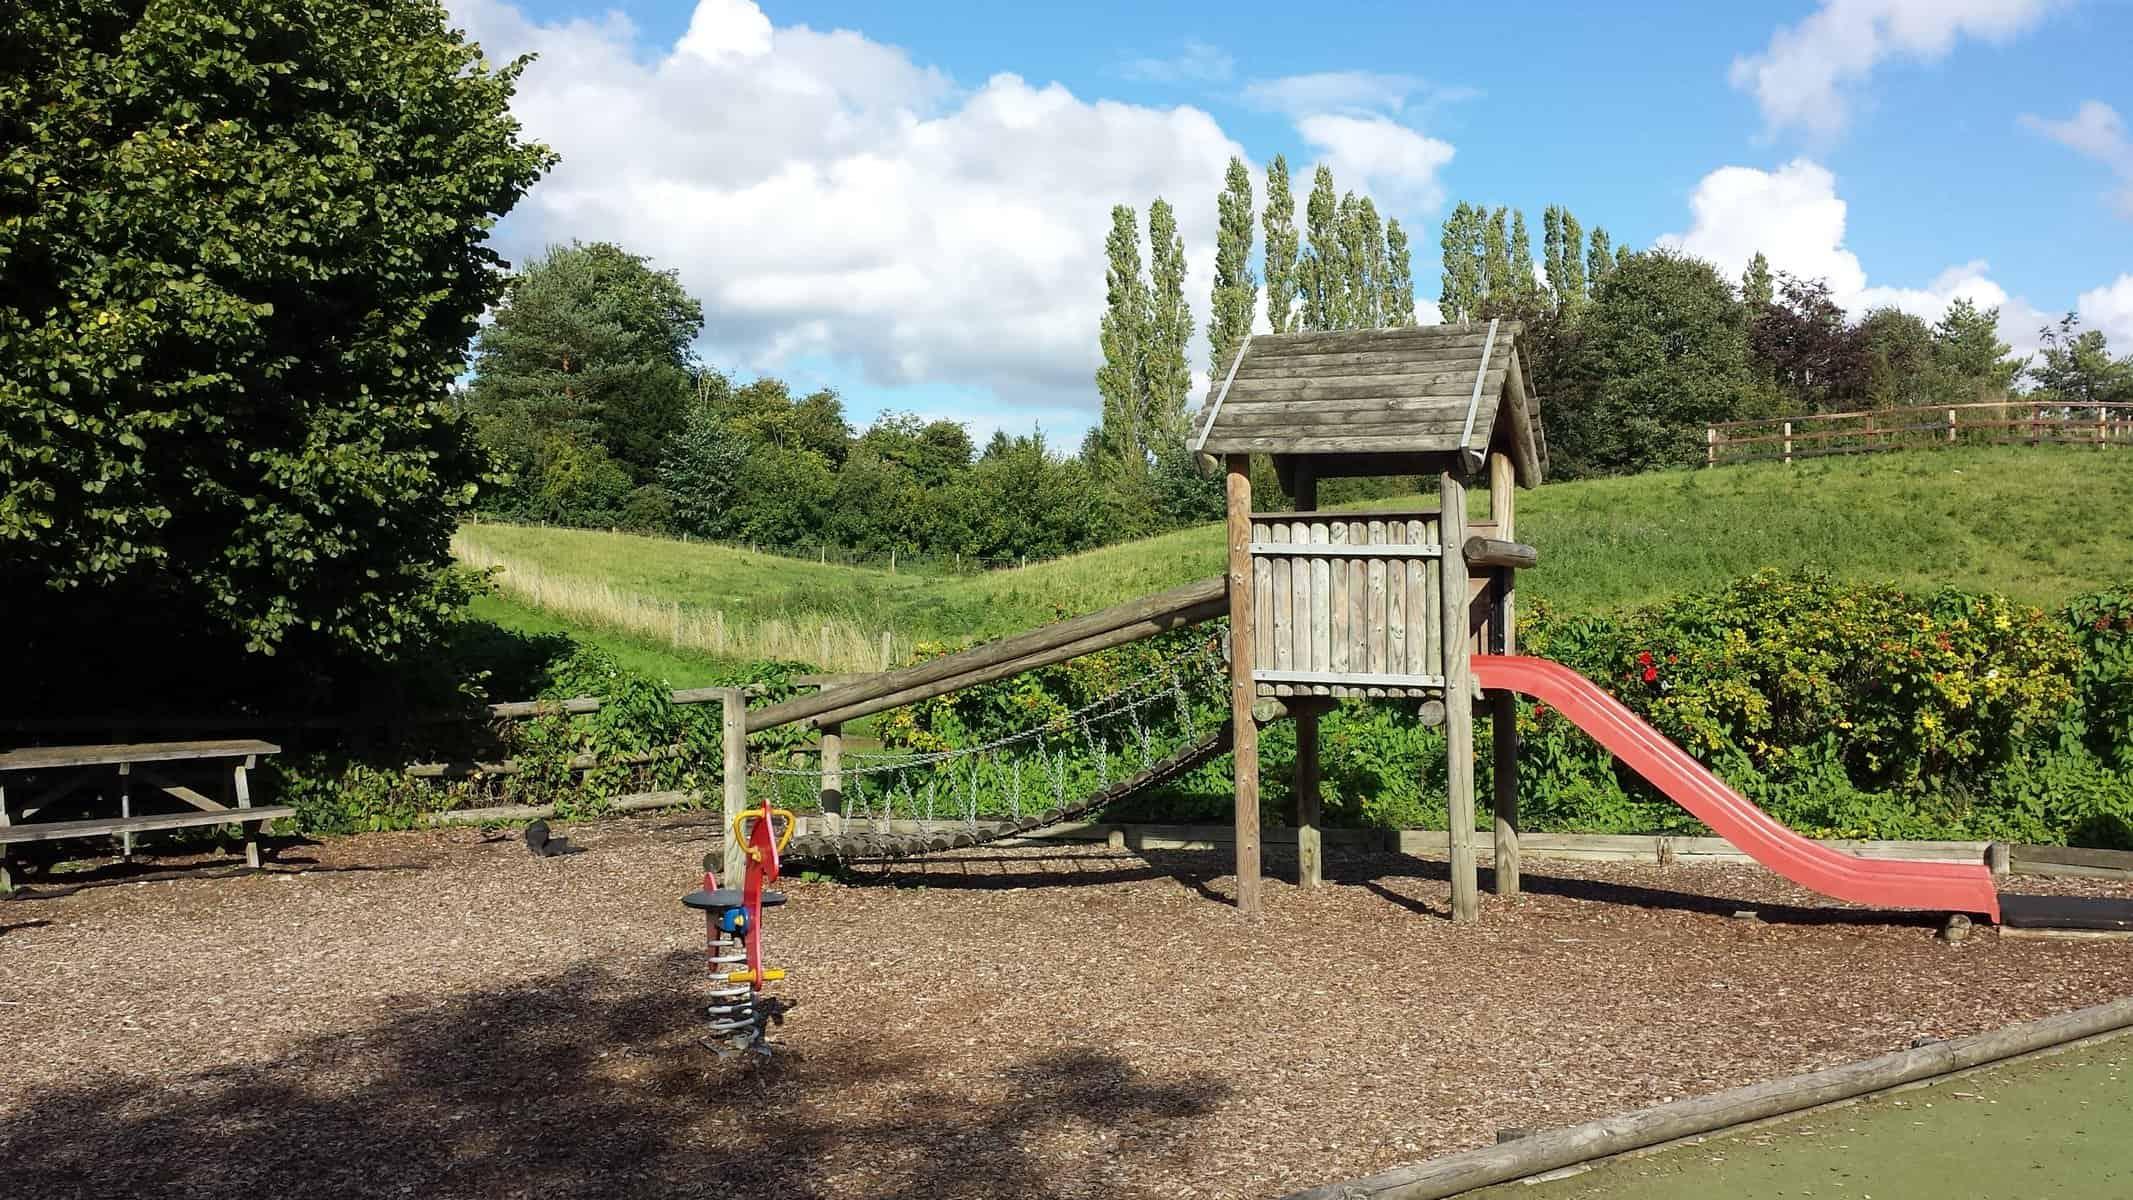 Penney Play Park